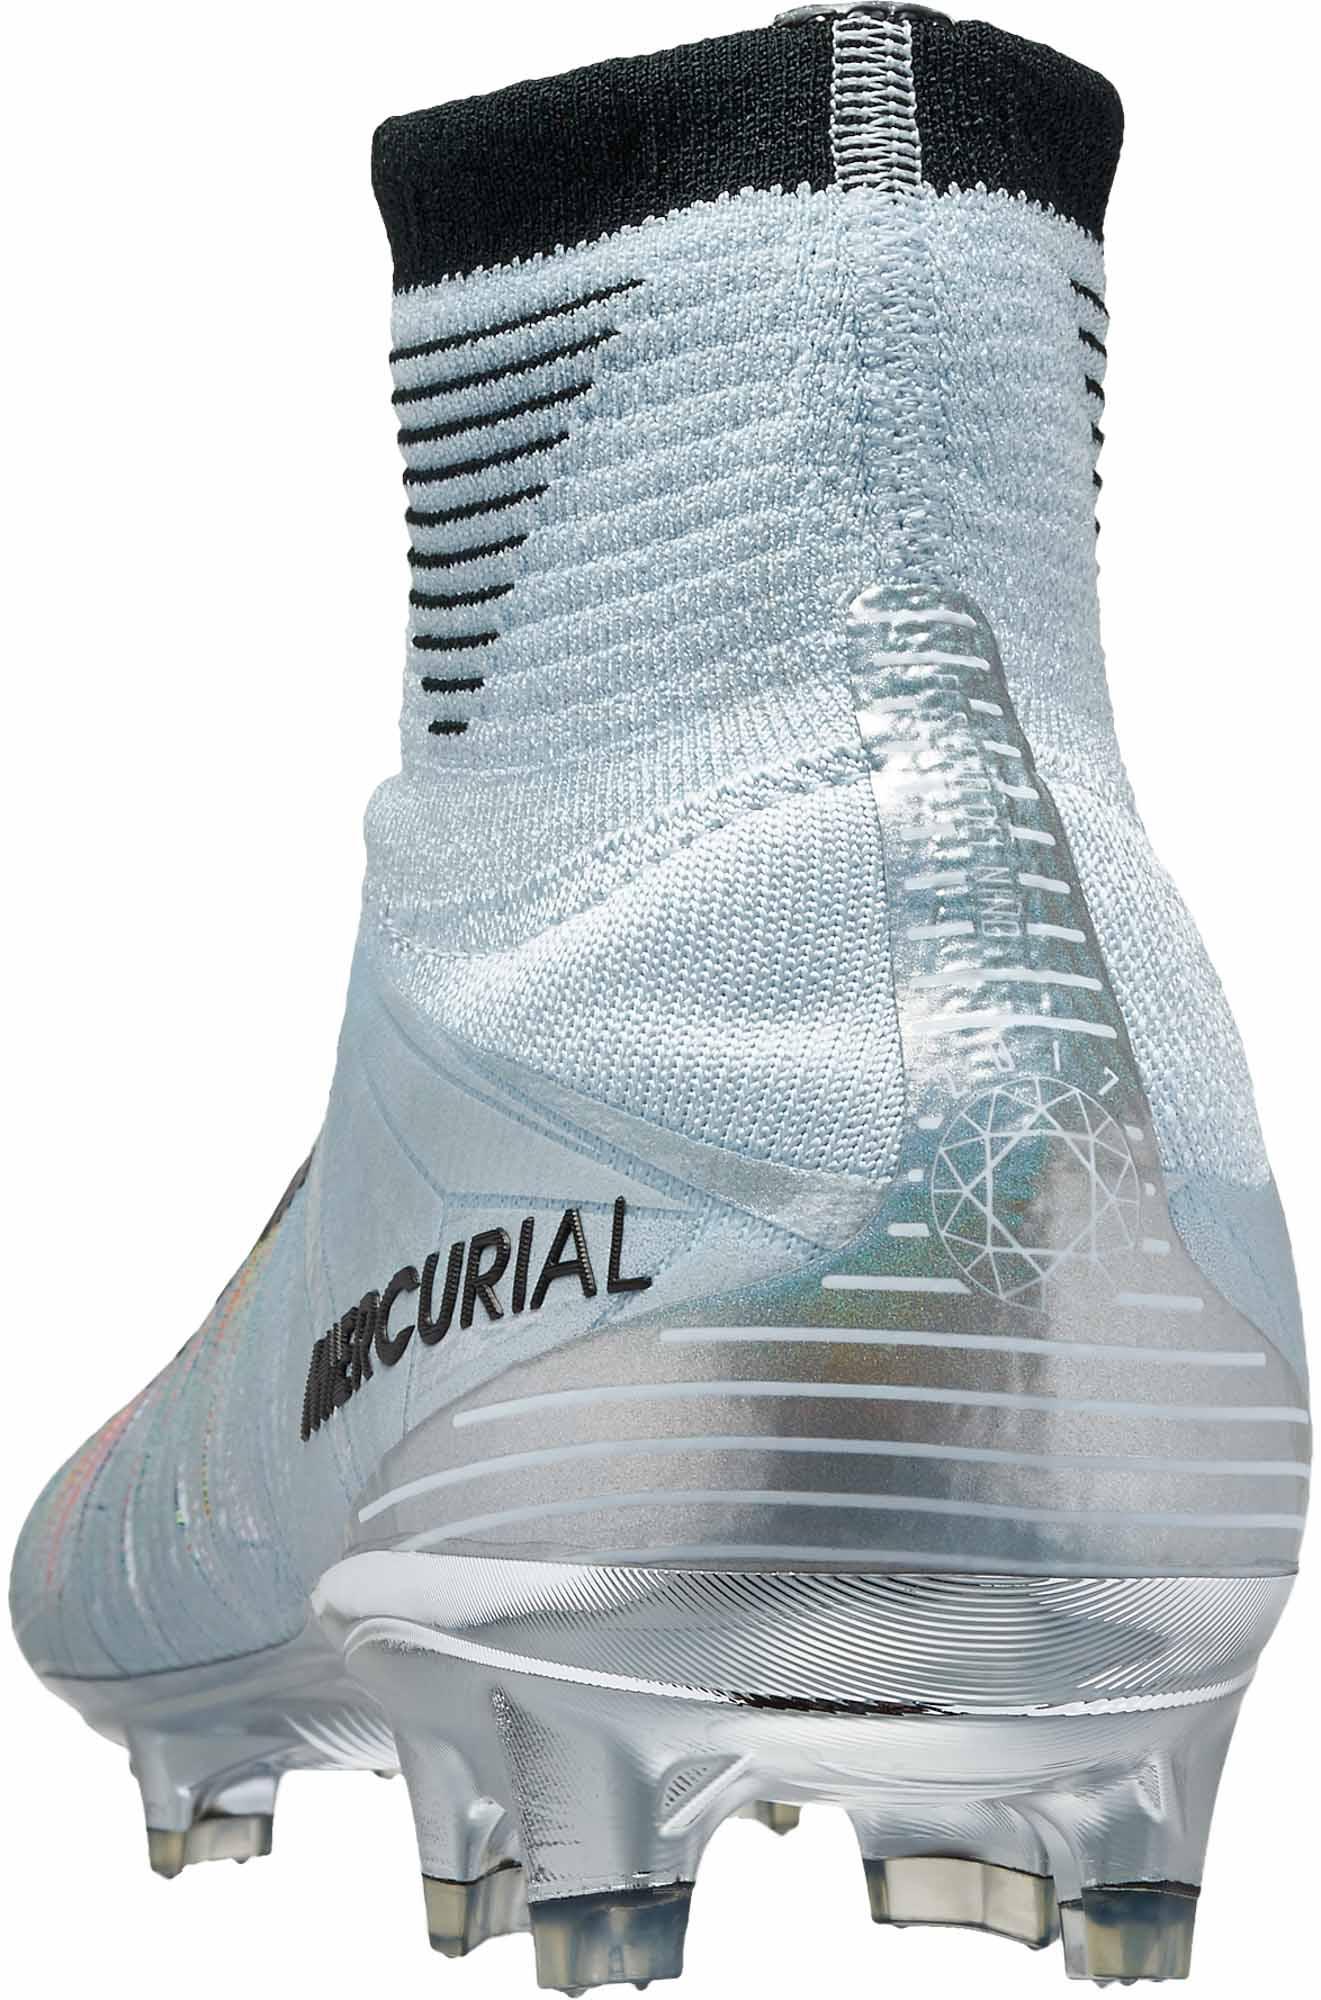 abe99ae15f28 Nike Mercurial Superfly V FG - CR7 Melhor - Blue Tint   Black ...